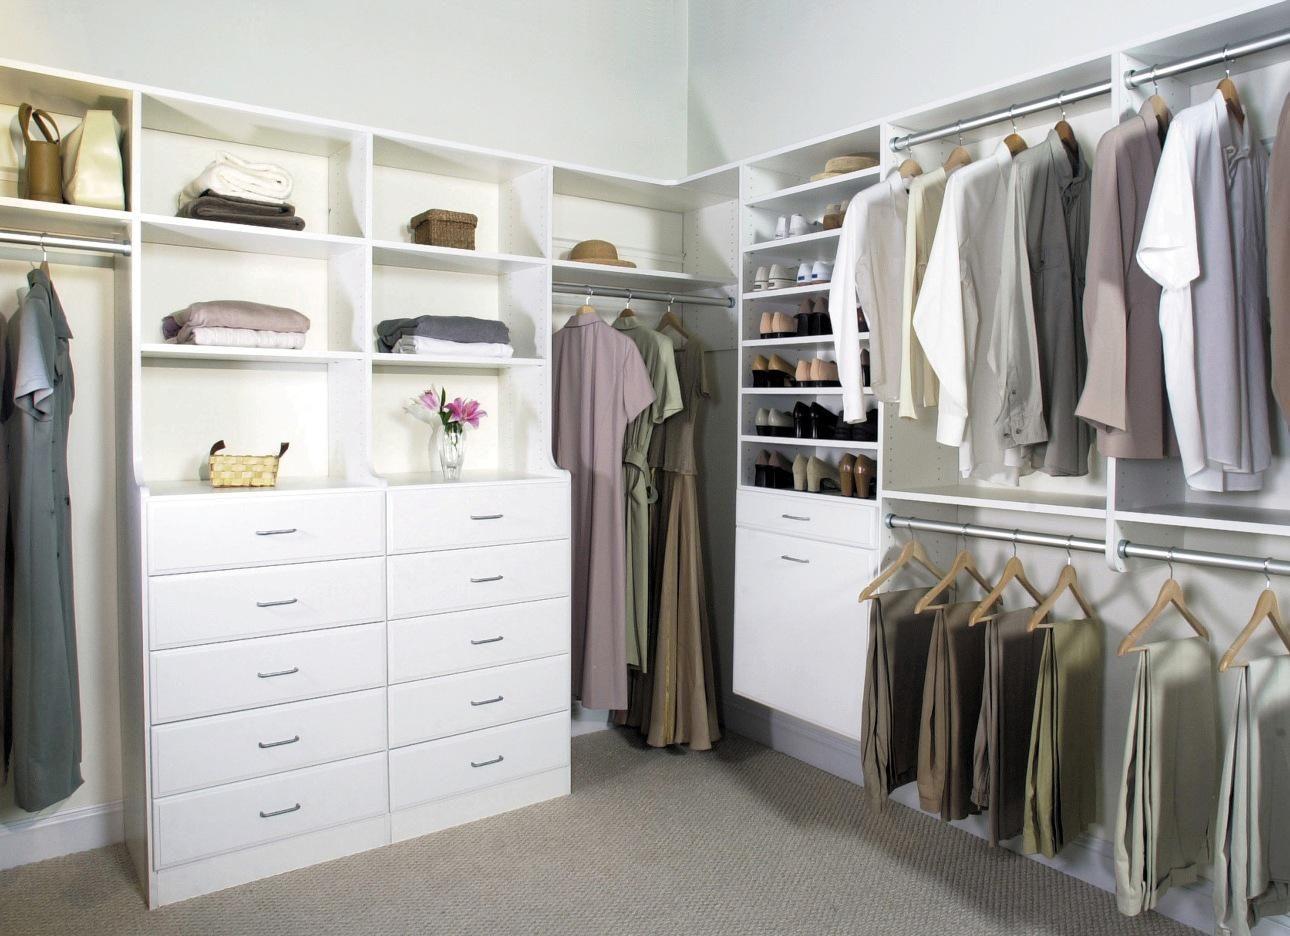 L Shaped Closet Organizer Designs And Plans Amazing Closet